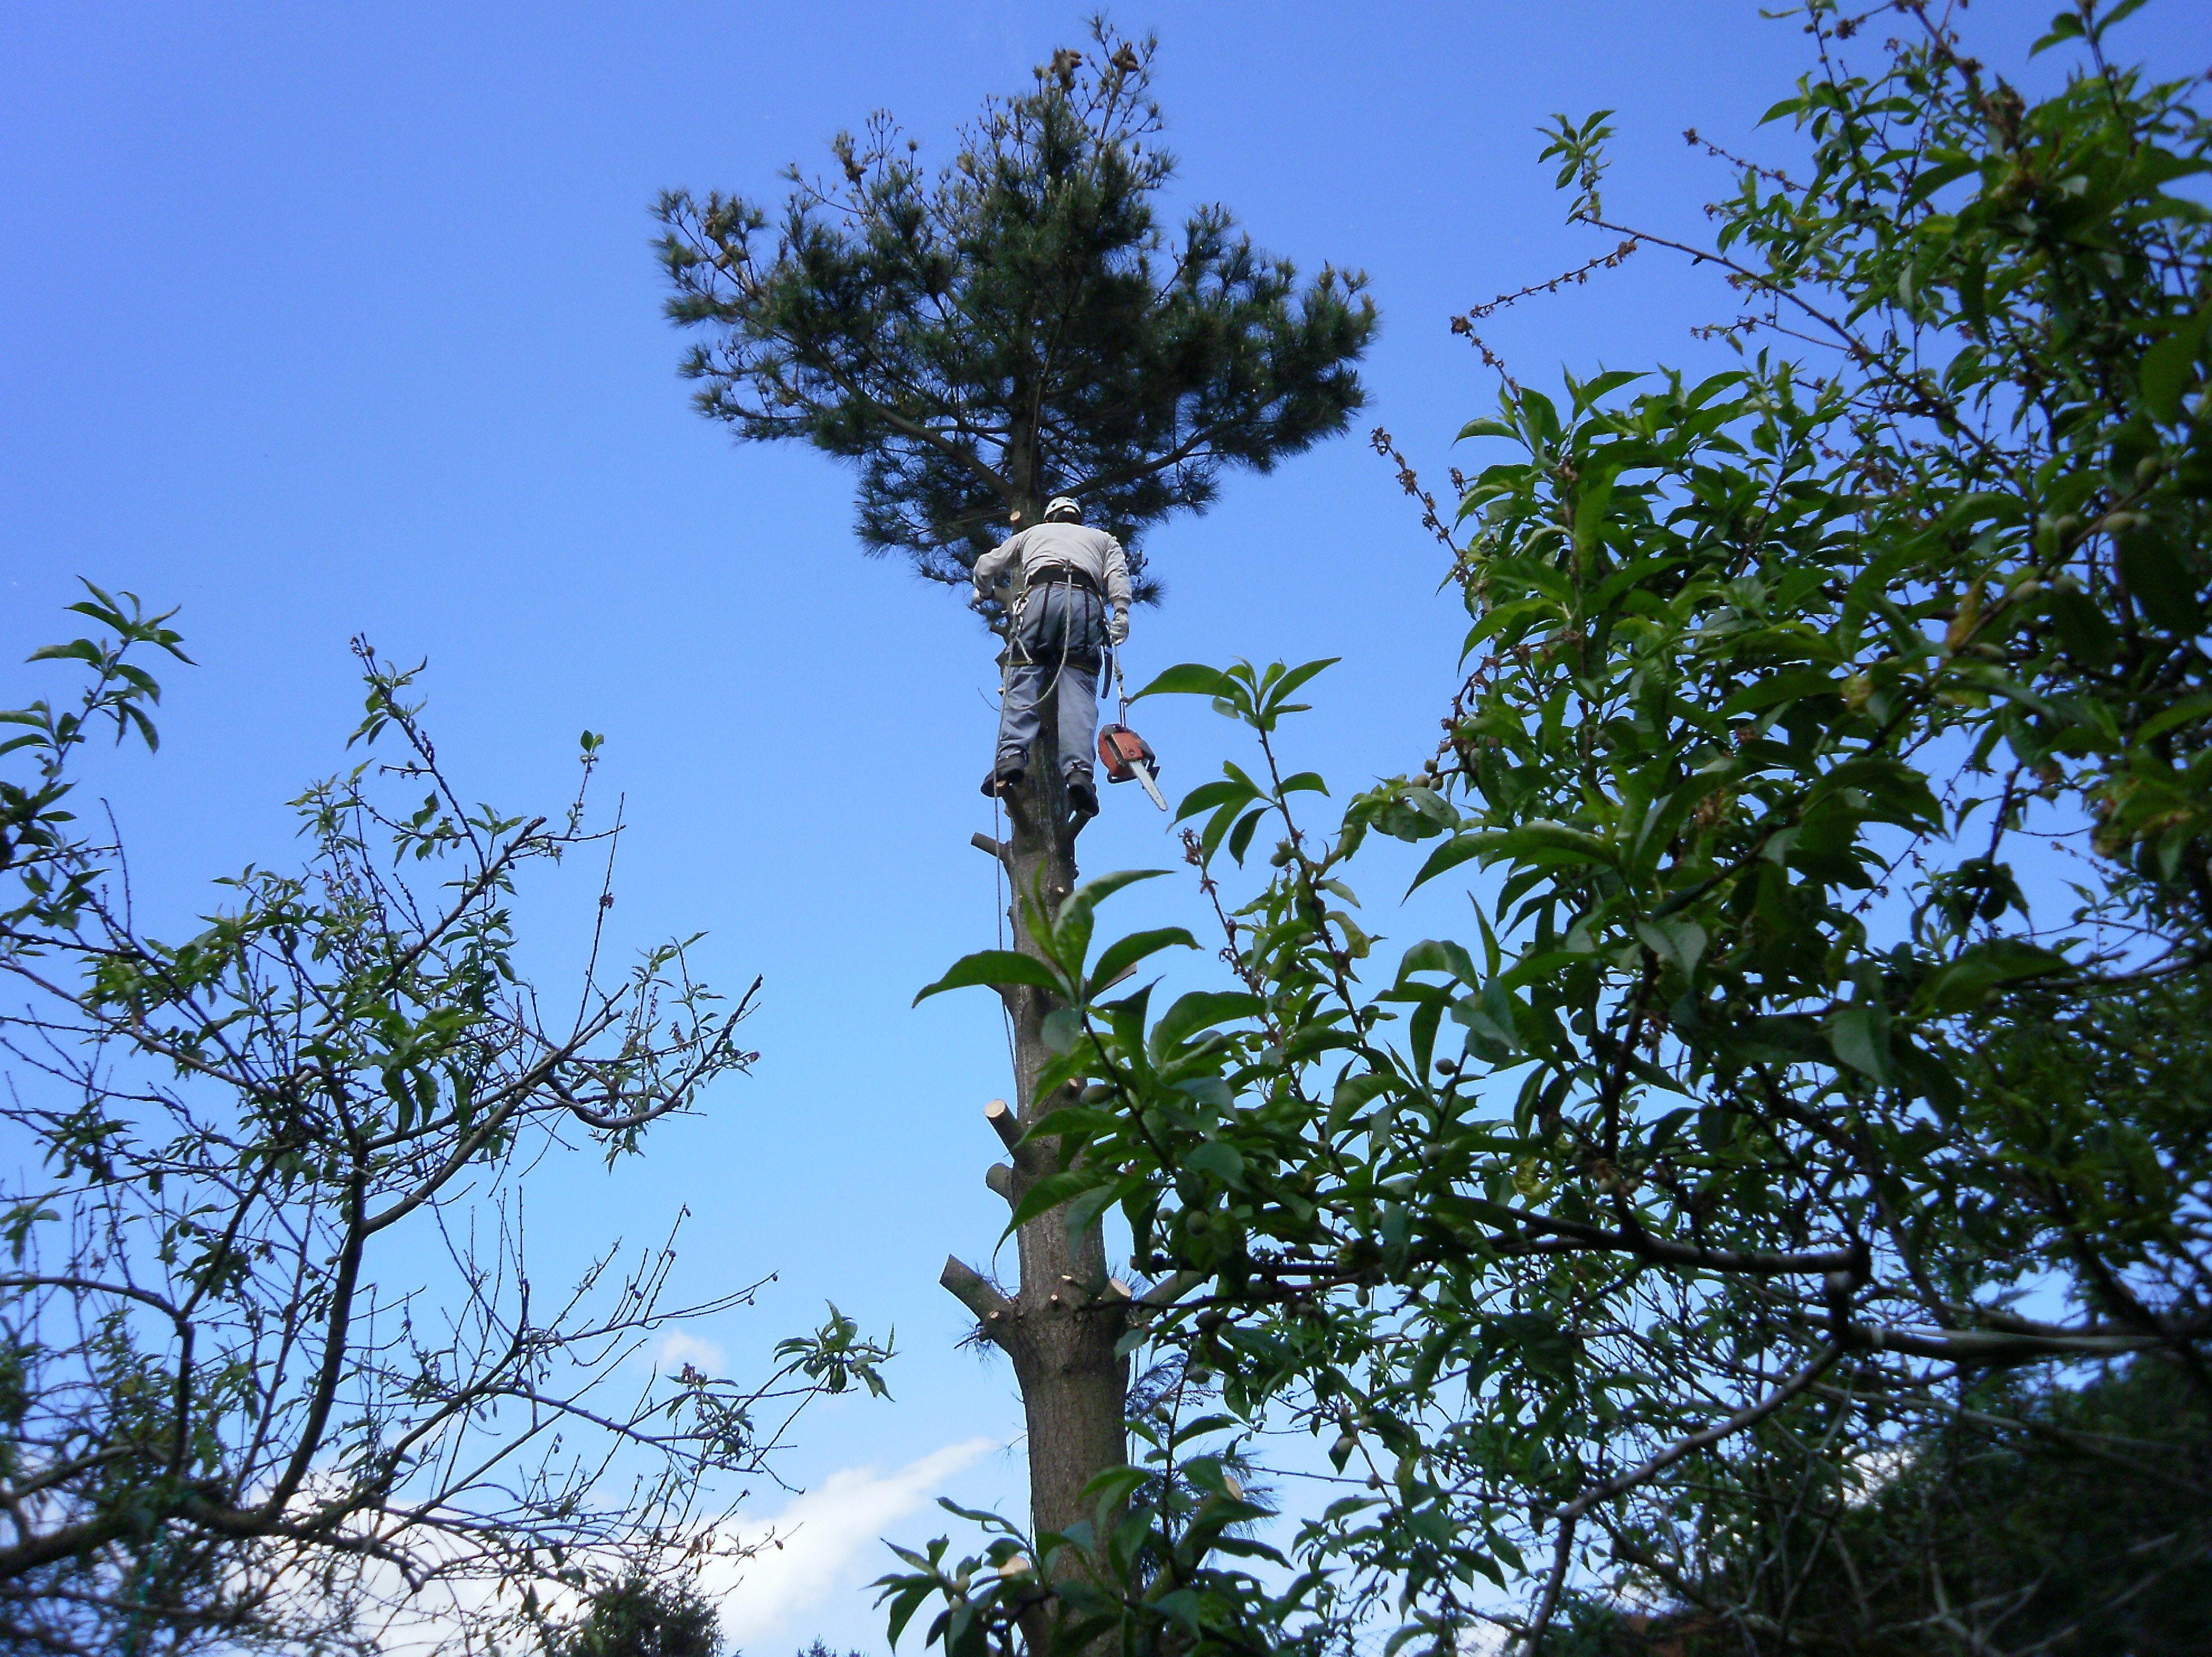 Podas de árboles en altura : Servicios que ofrecemos   de Casverde